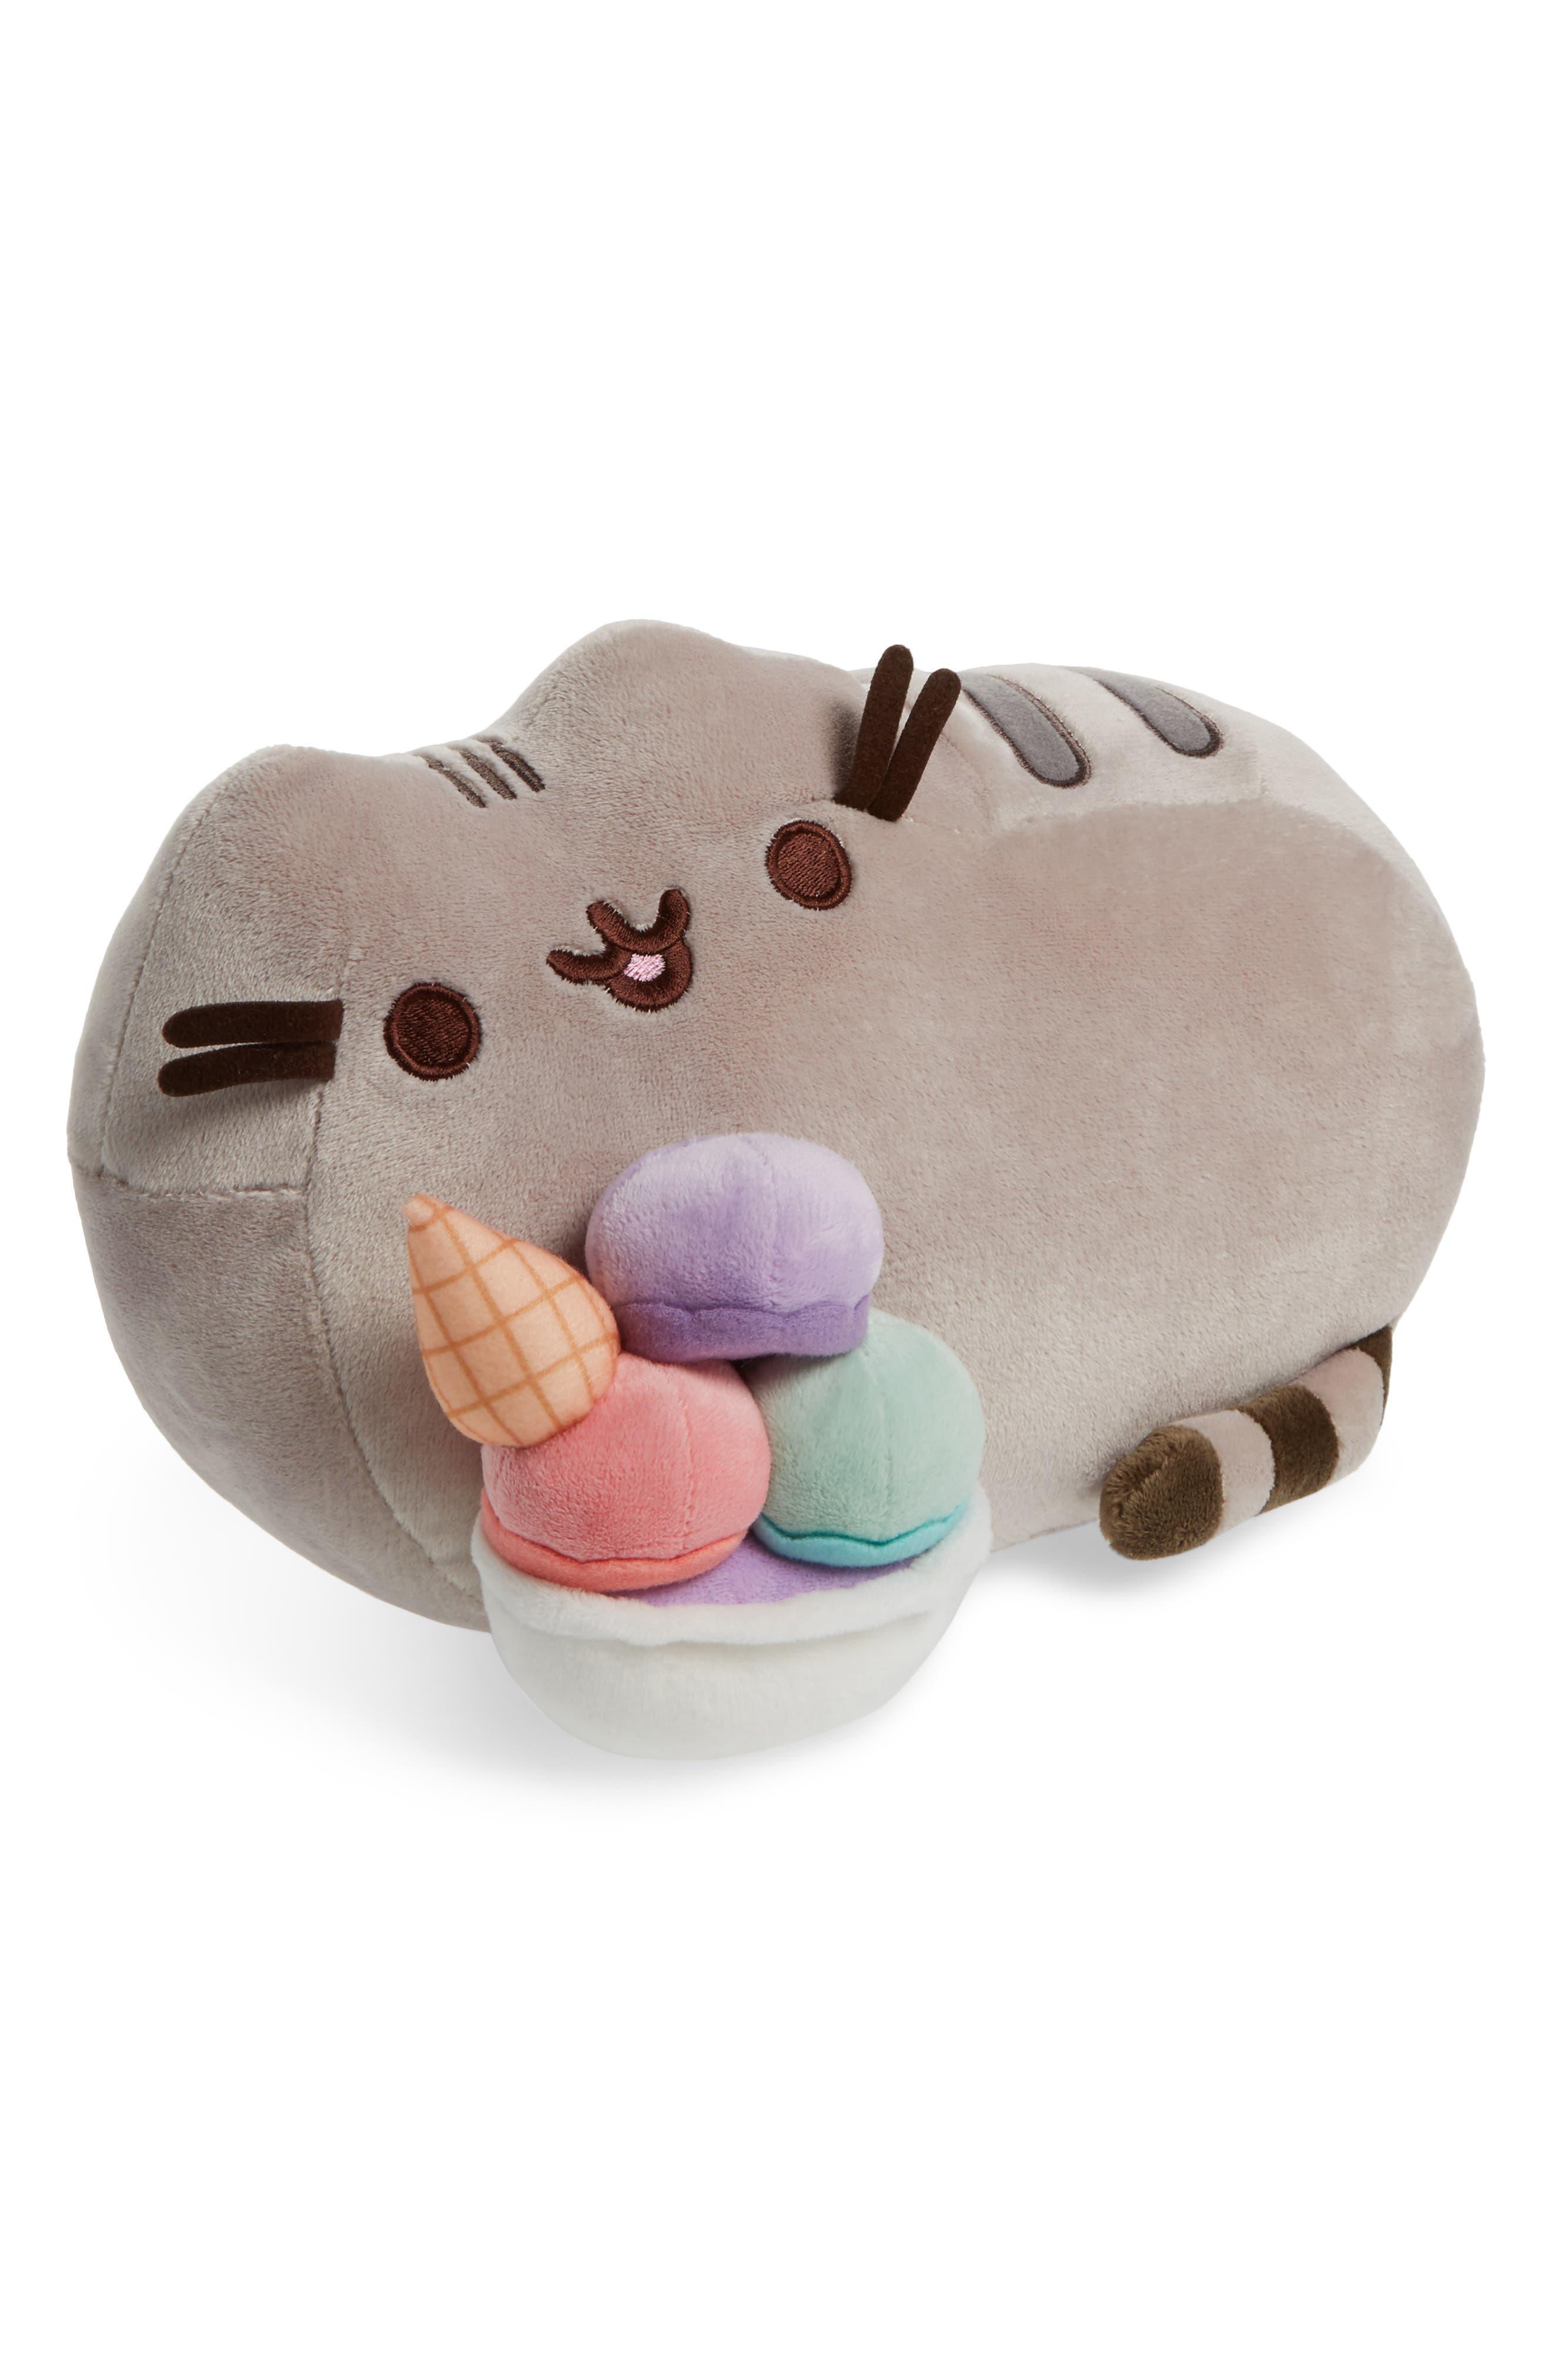 Pusheen Sundae Stuffed Animal,                             Main thumbnail 1, color,                             020